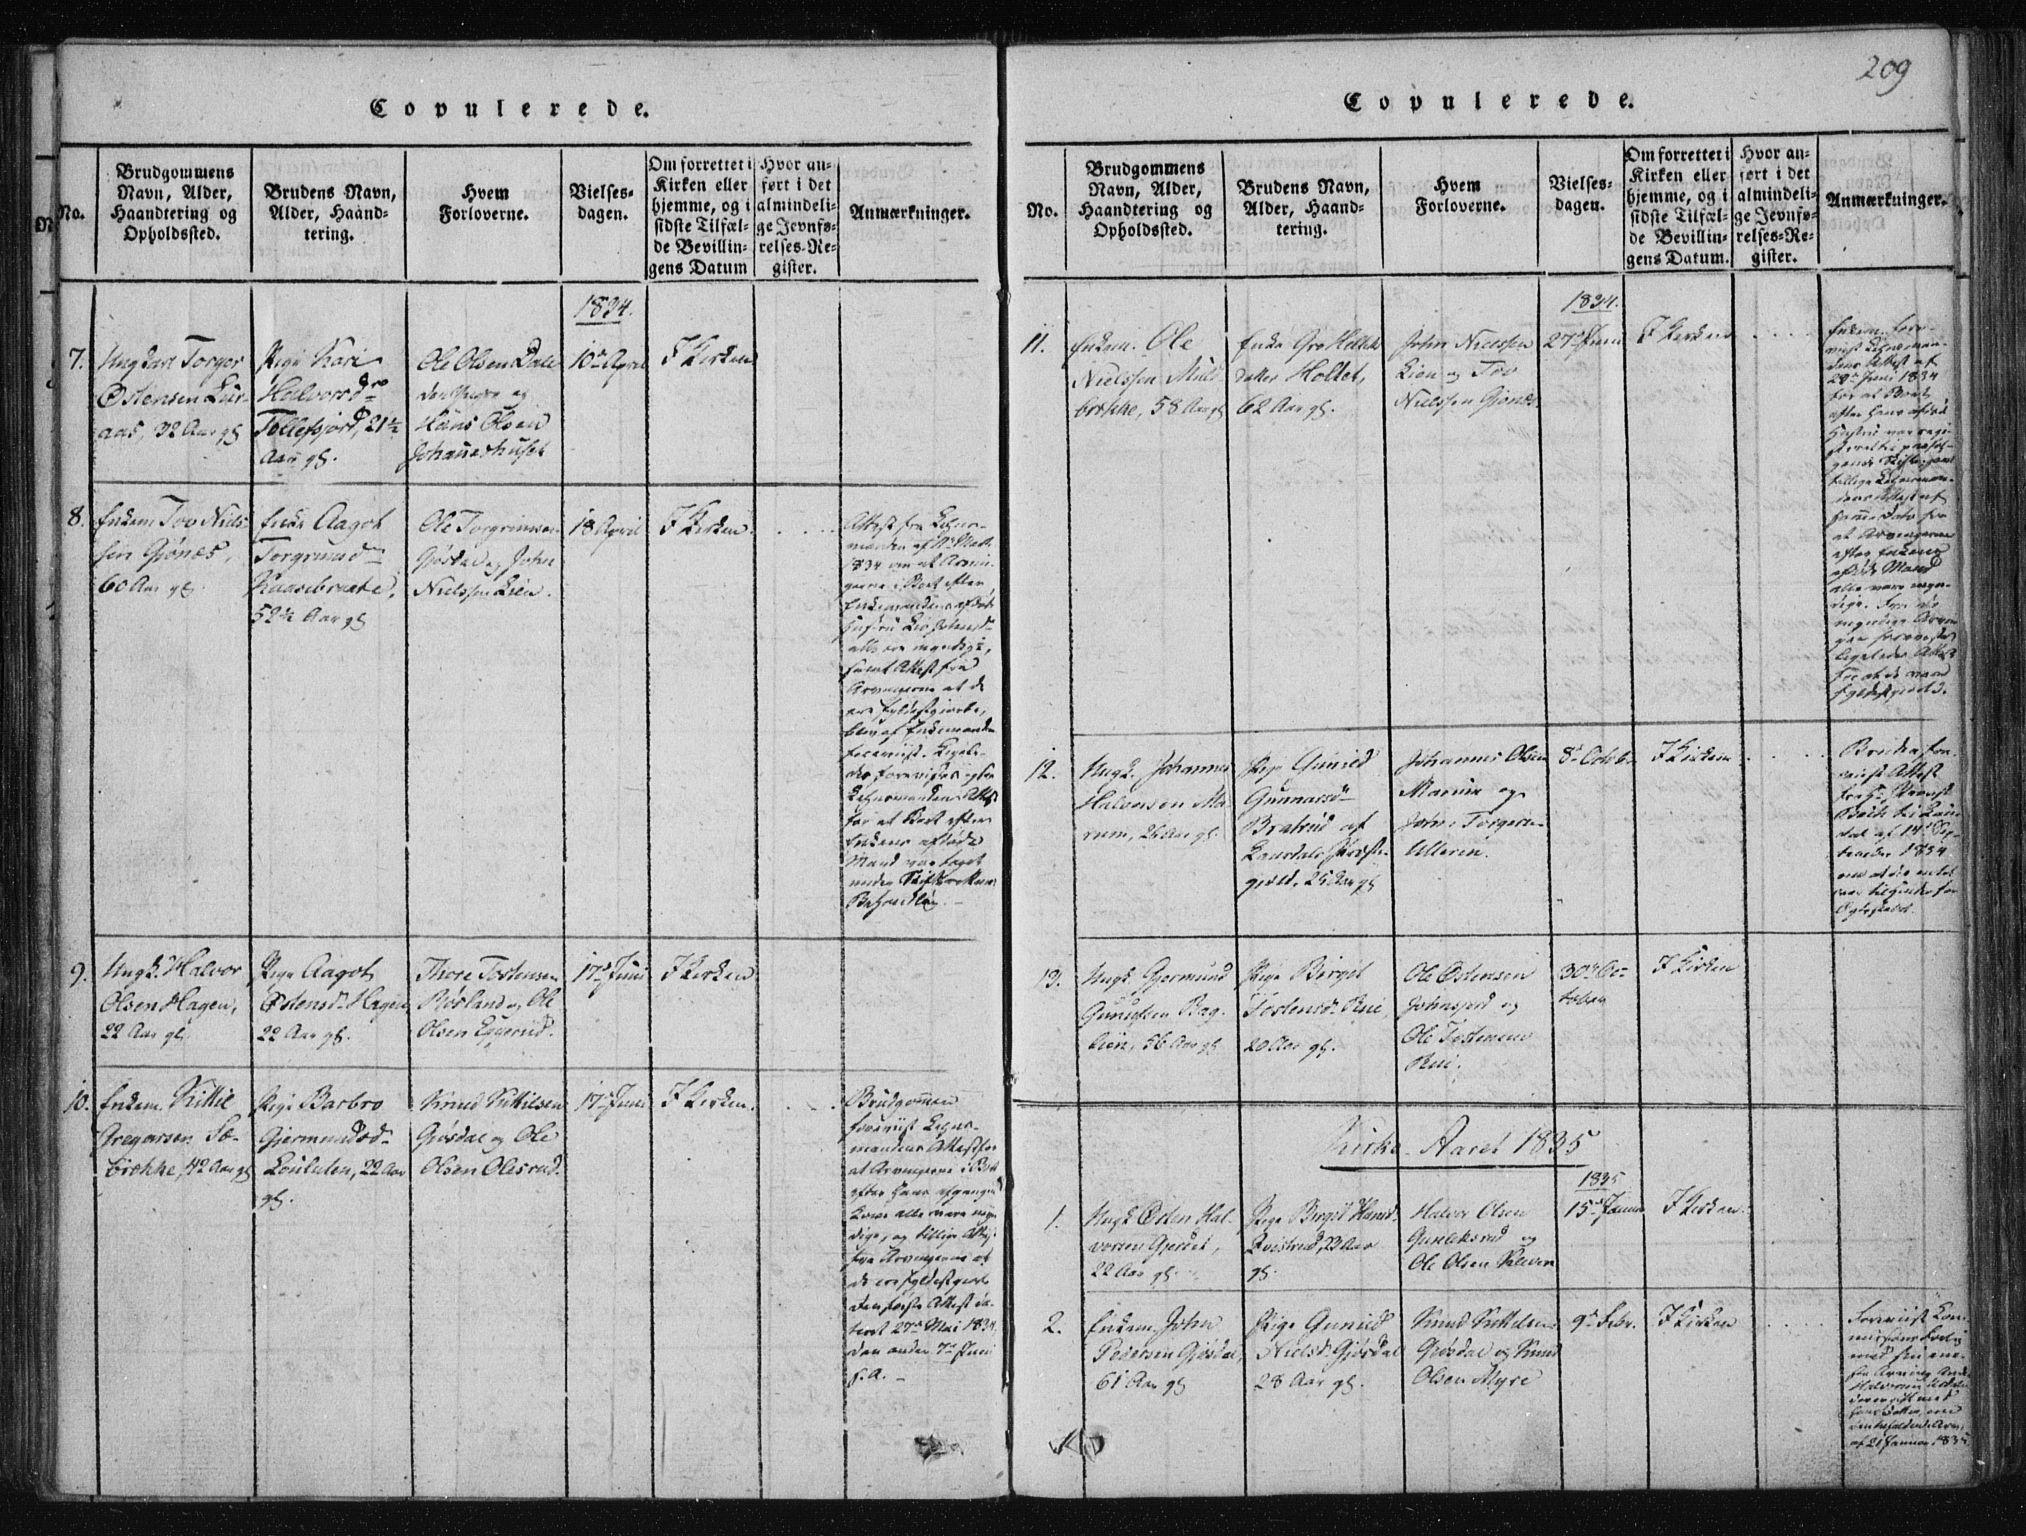 SAKO, Tinn kirkebøker, F/Fa/L0004: Ministerialbok nr. I 4, 1815-1843, s. 209